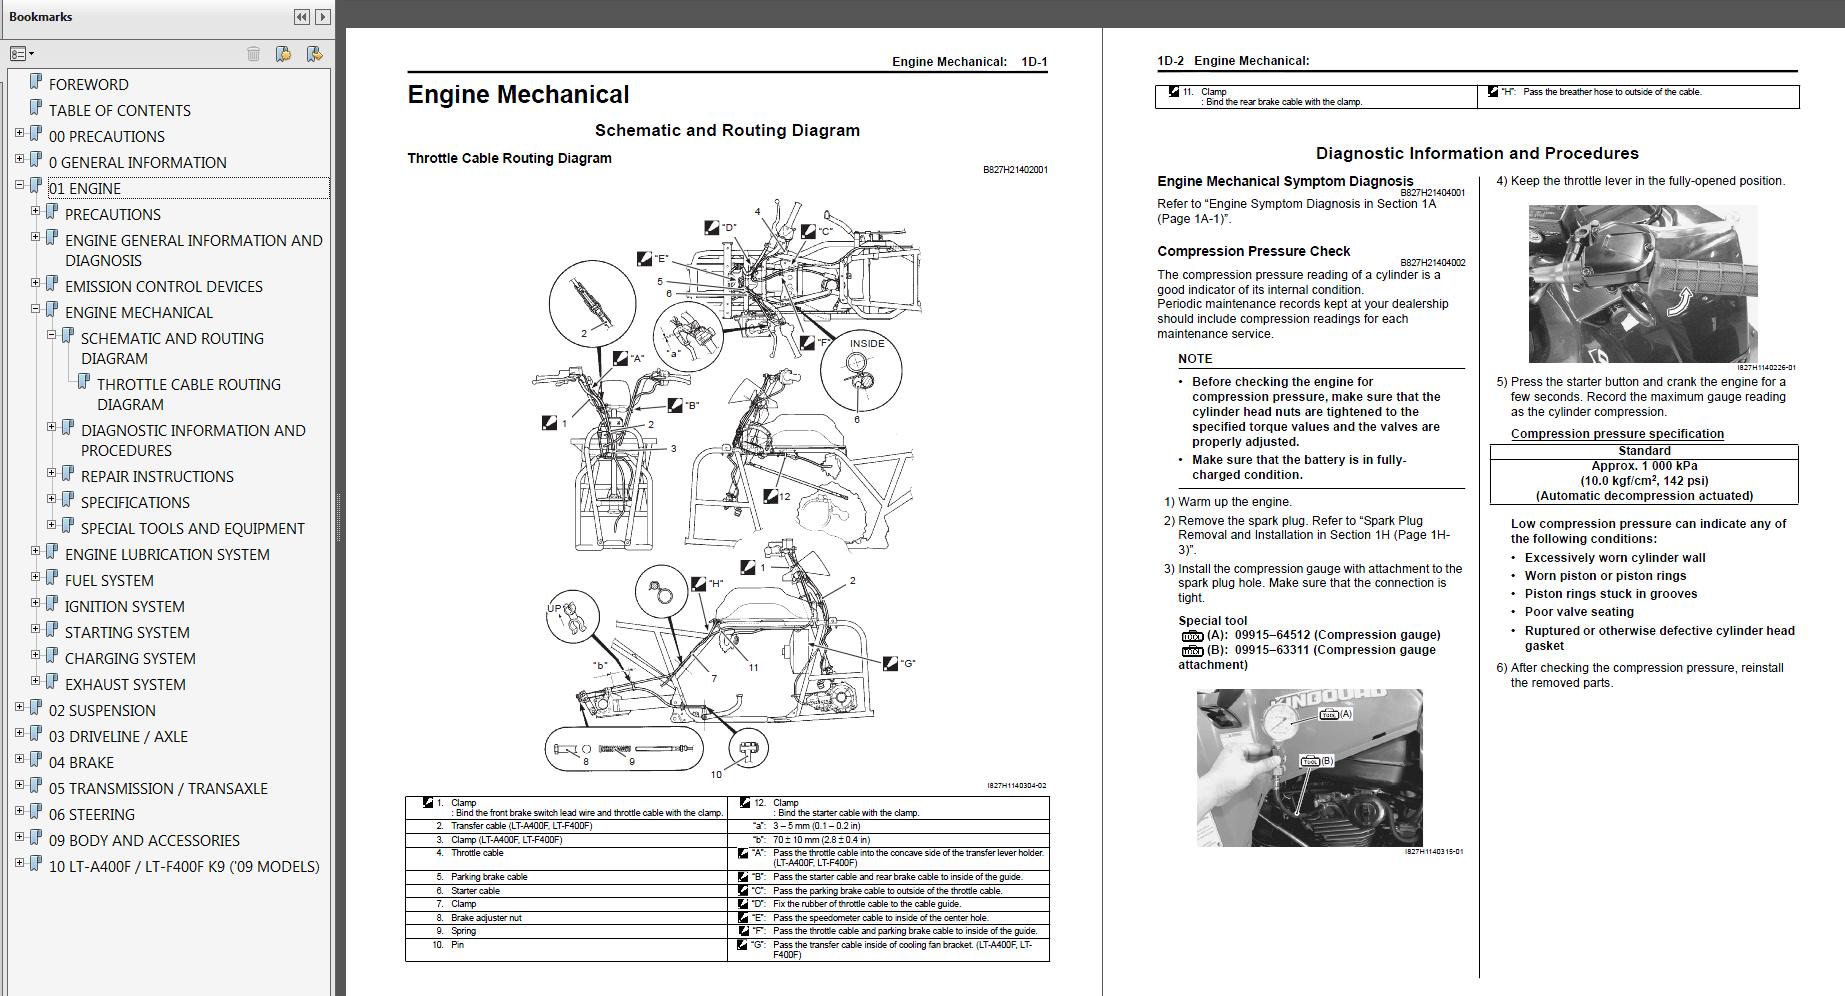 hight resolution of  763072 arctic cat dvx 400 manual free